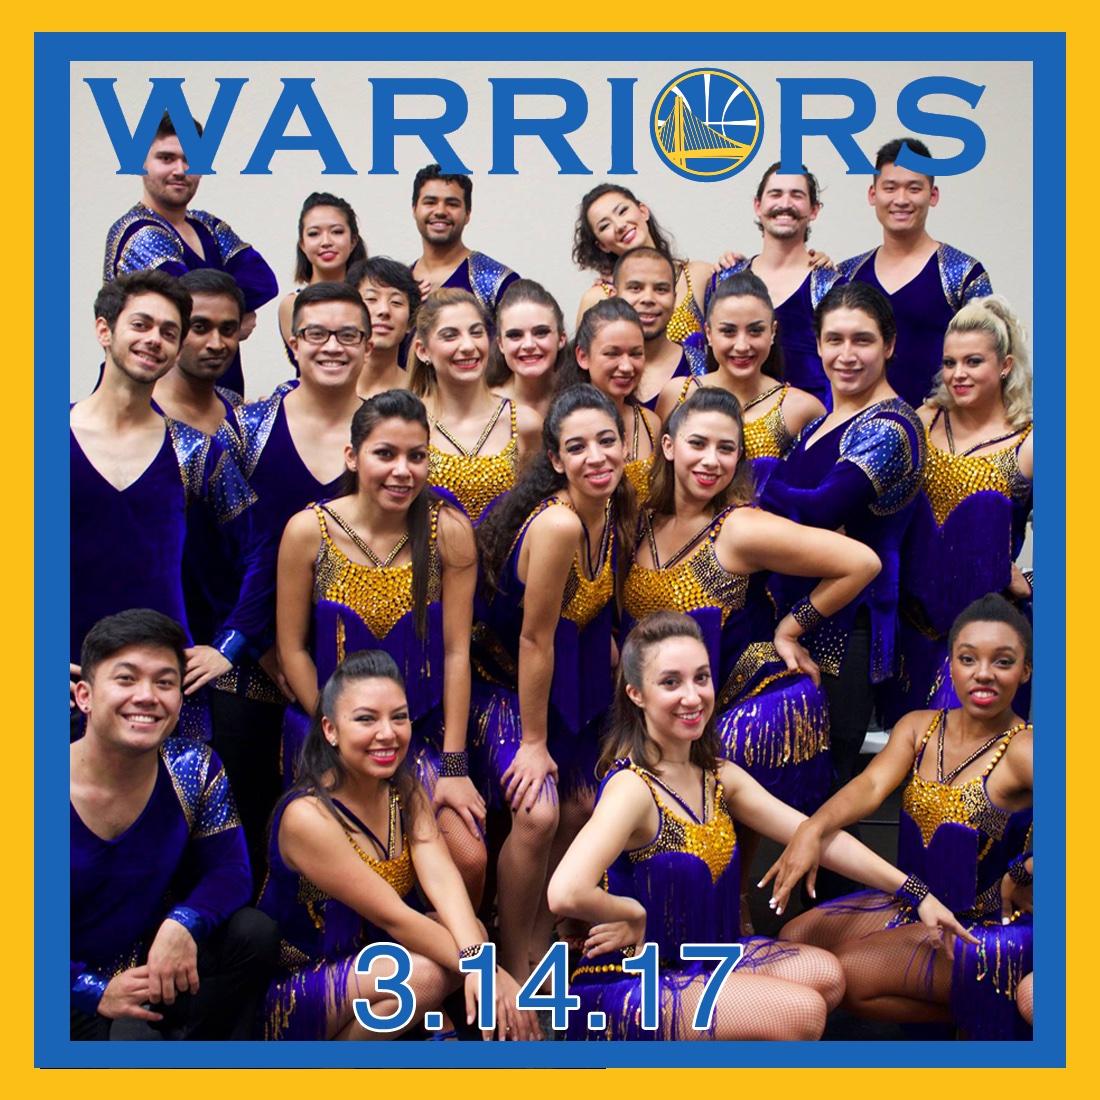 Spartan Mambo Golden State Warriors